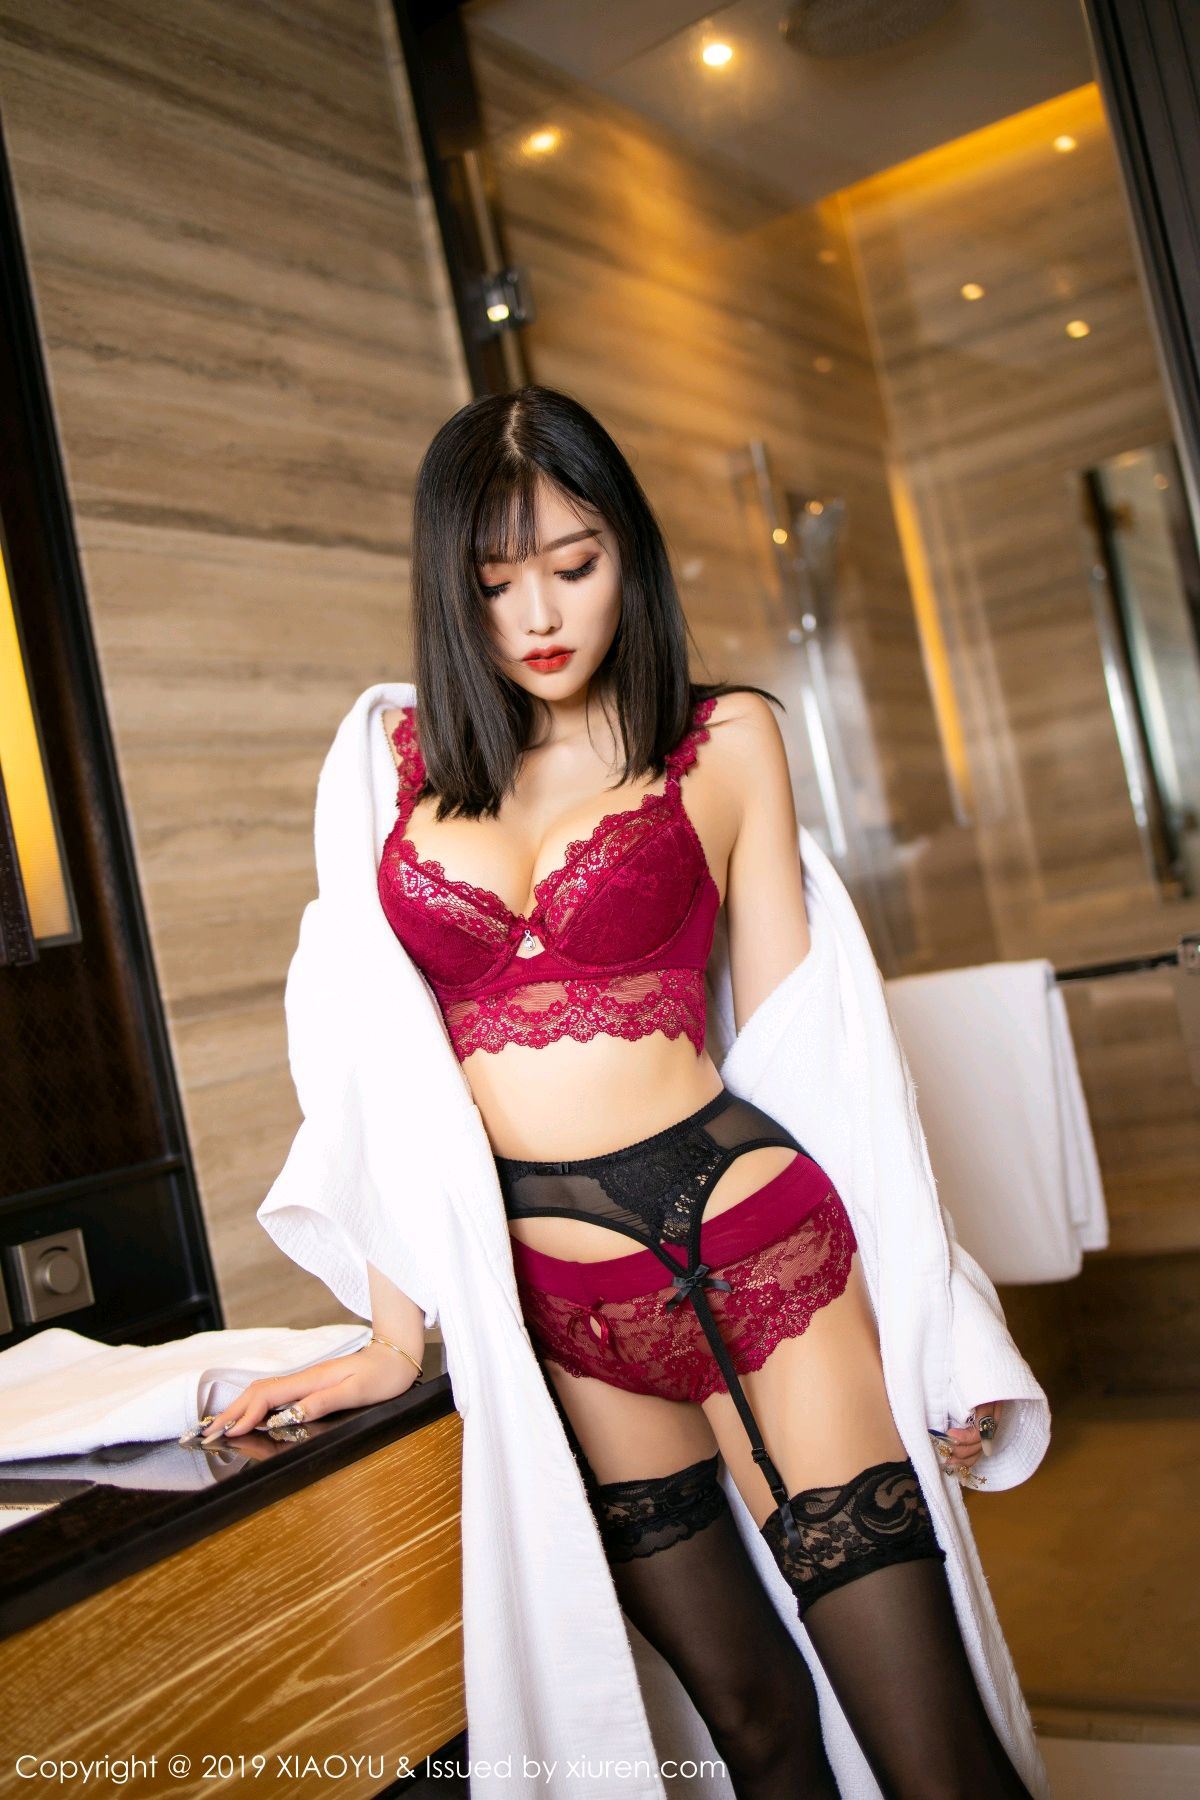 [XiaoYu] Vol.153 Yang Chen Chen 36P, Bathroom, Black Silk, Underwear, XiaoYu, Yang Chen Chen